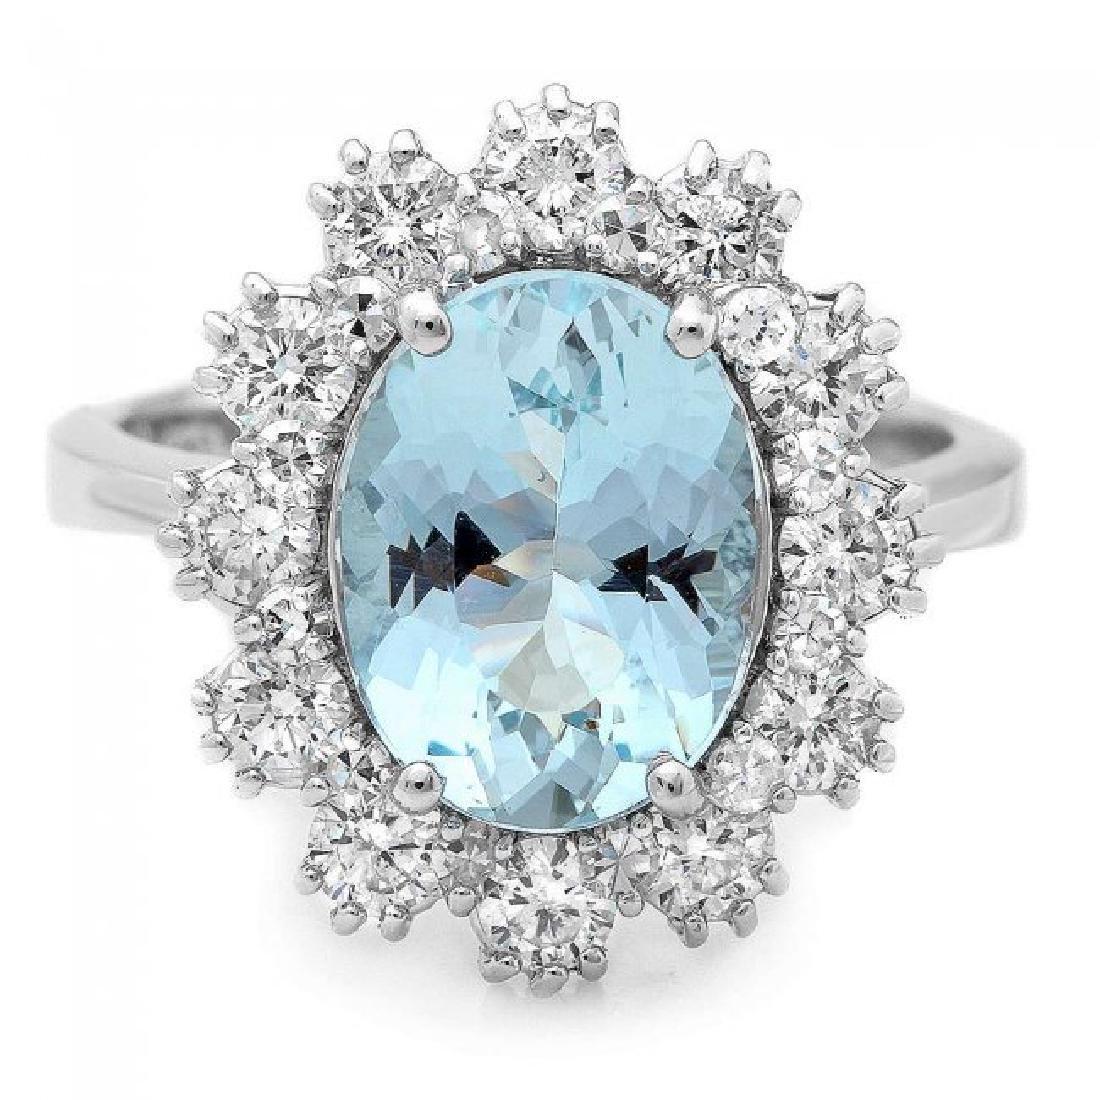 14k Gold 1.25ct Aquamarine 1.25ct Diamond Ring - 2